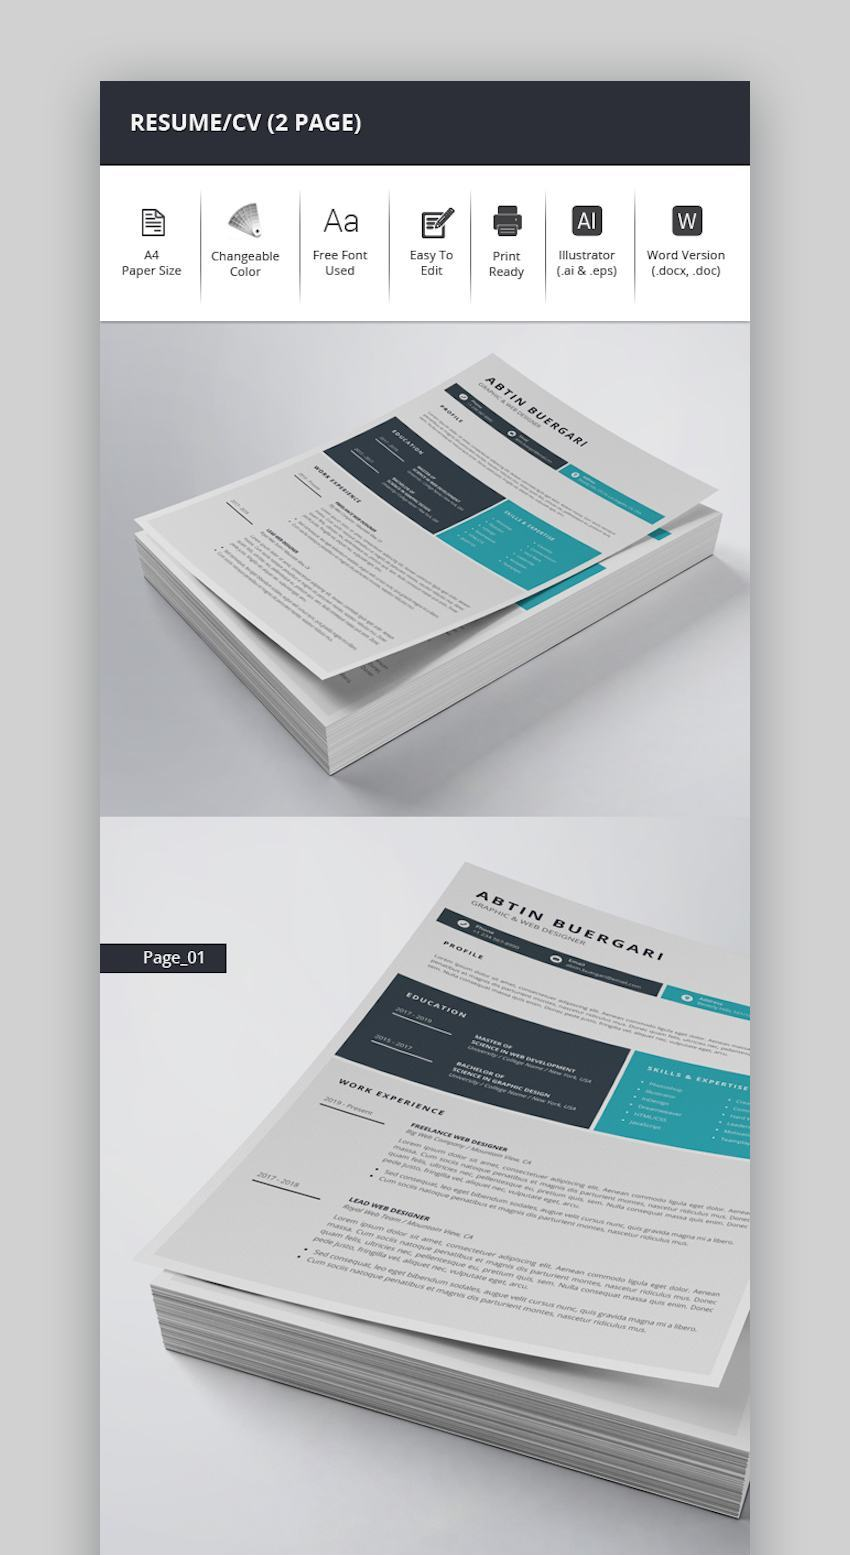 ResumeCV 2 Page